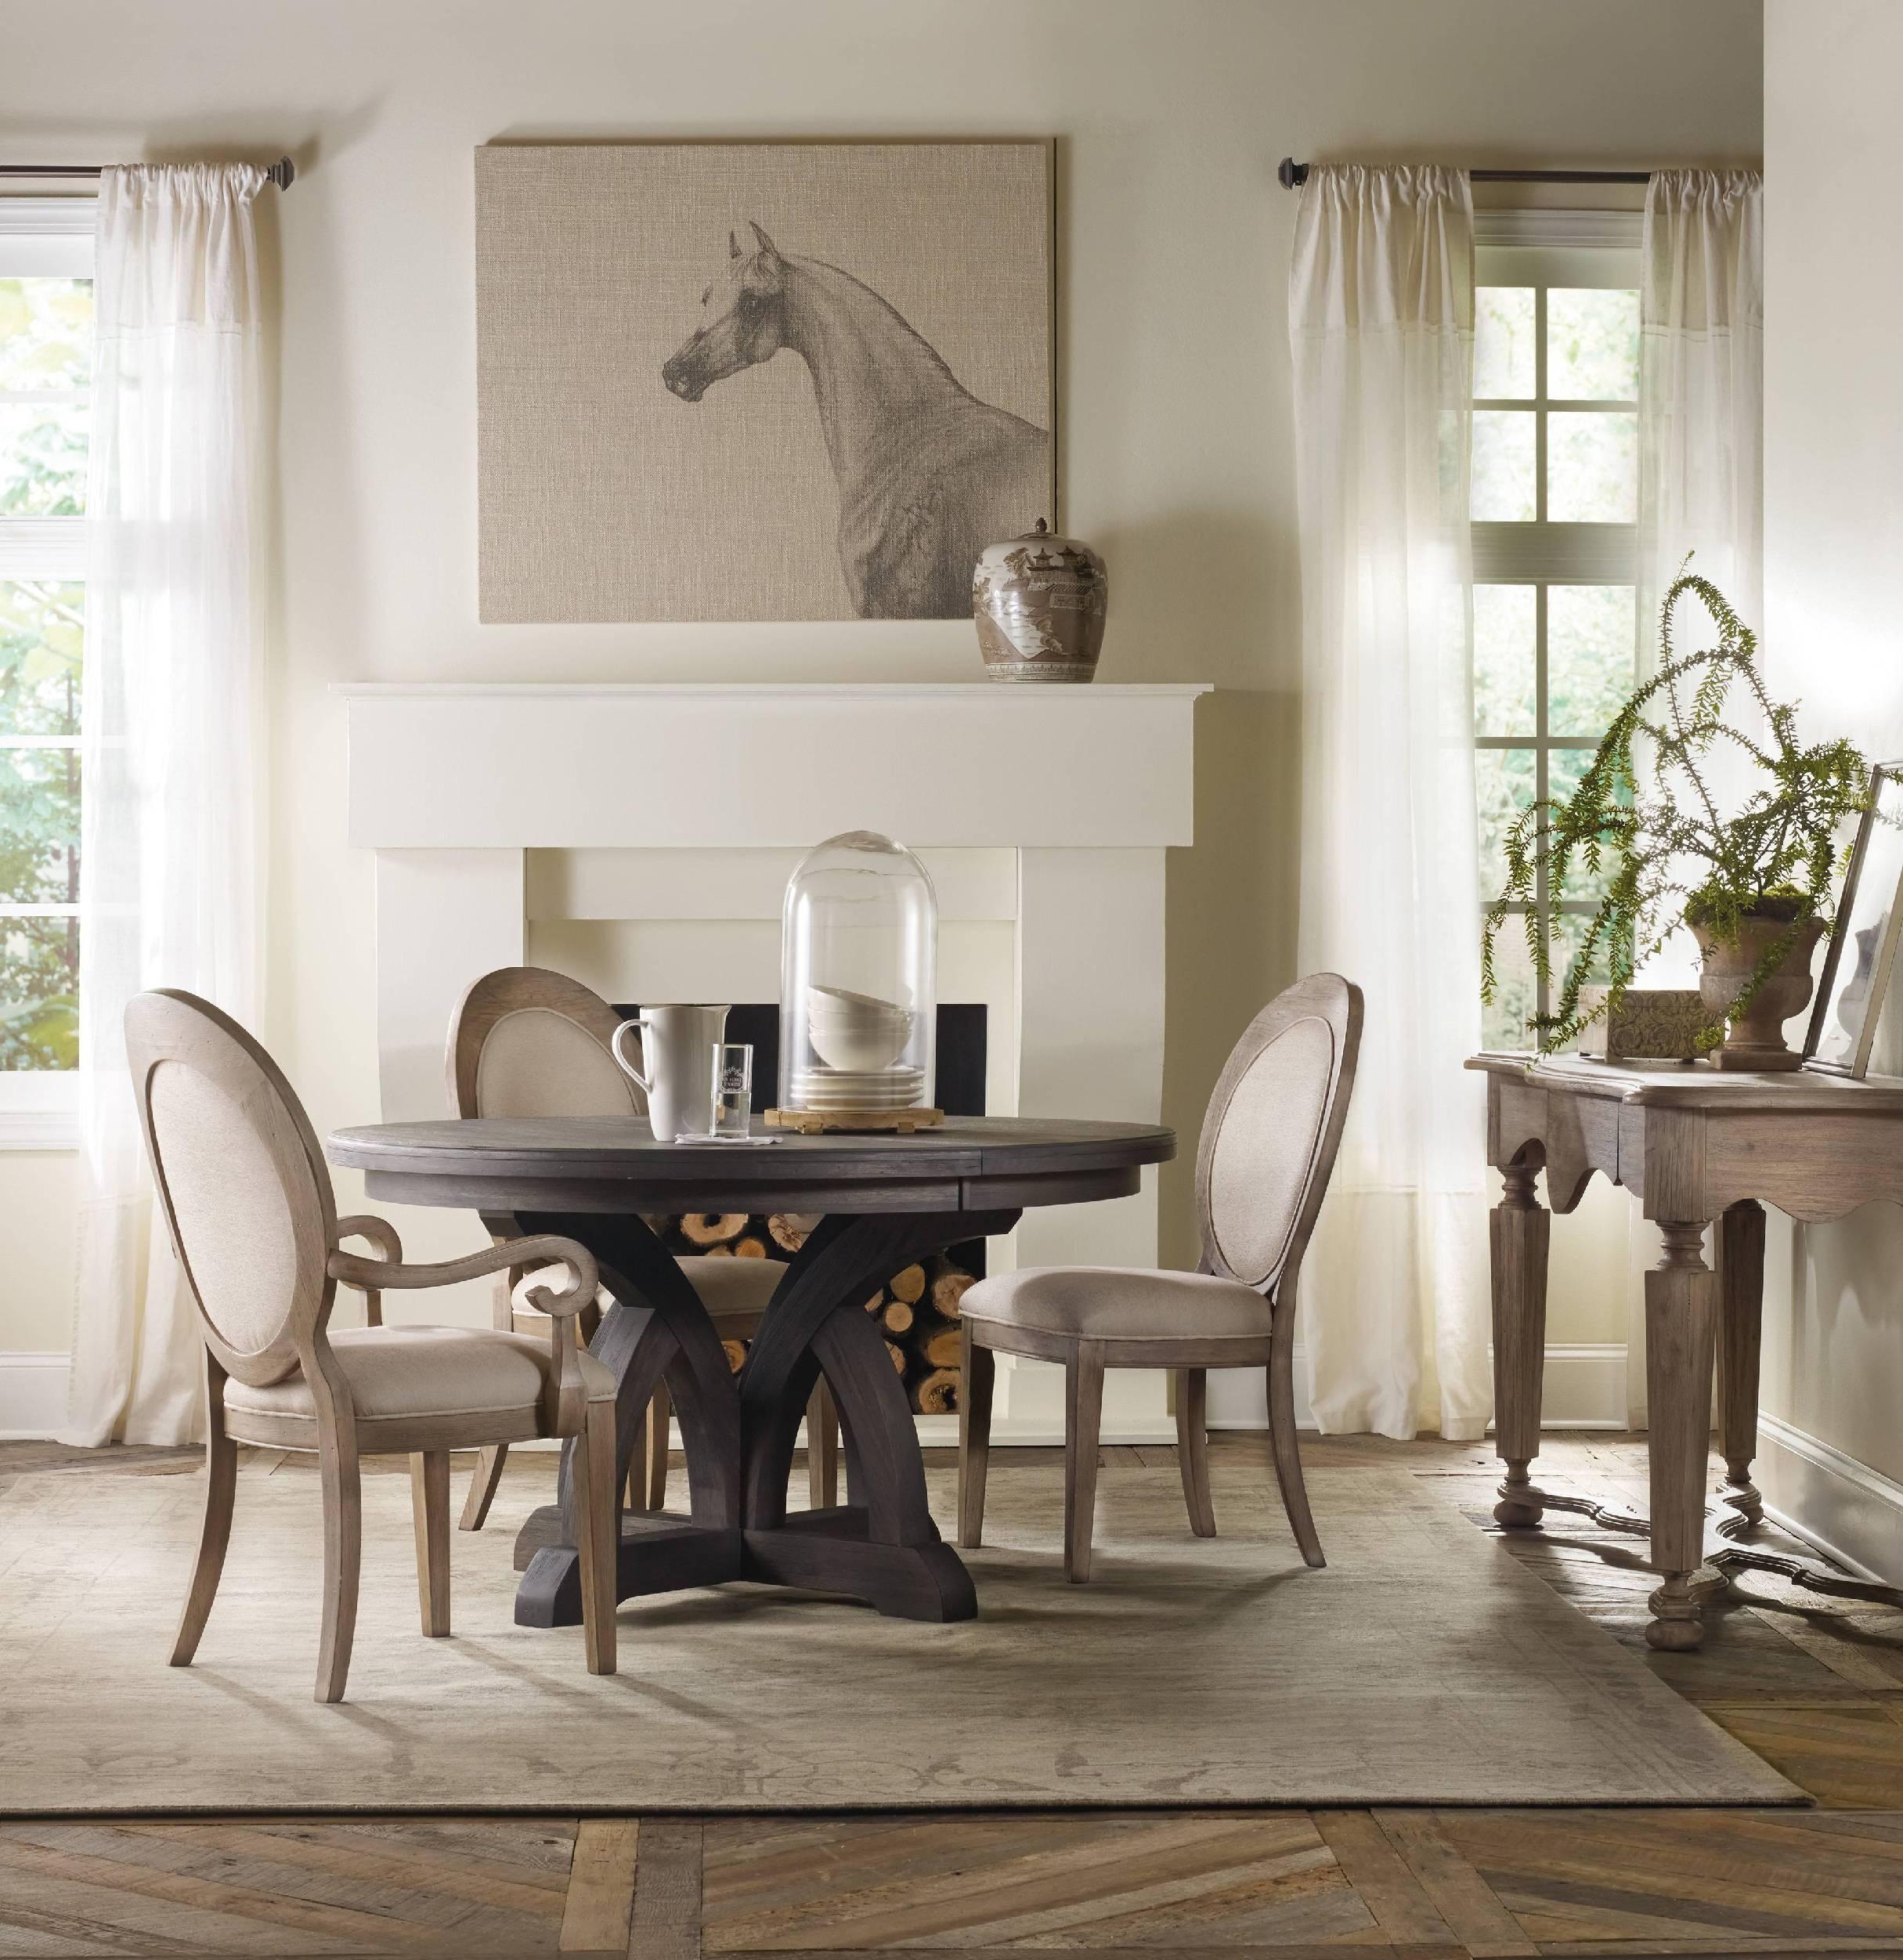 Hooker Furniture Dining Room Corsica Dark Round Dining Table W - Hooker corsica dining table